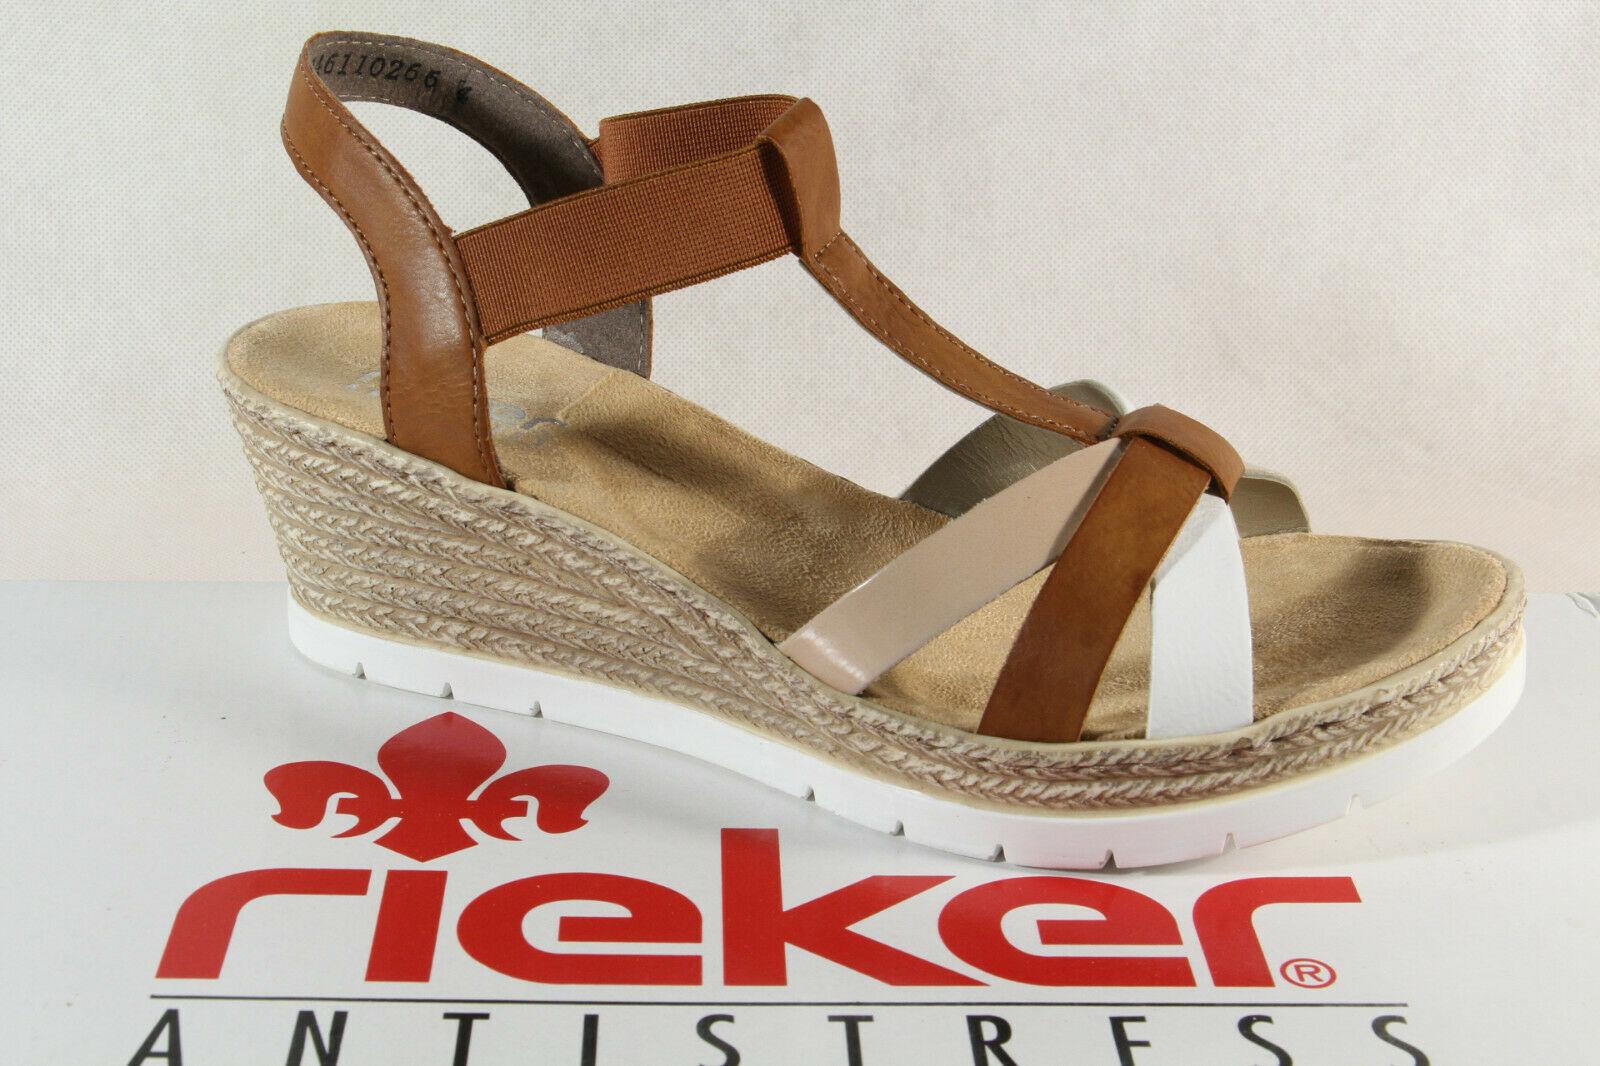 Rieker Damen Sandalen Sandaletten weiss weiche Innensohle